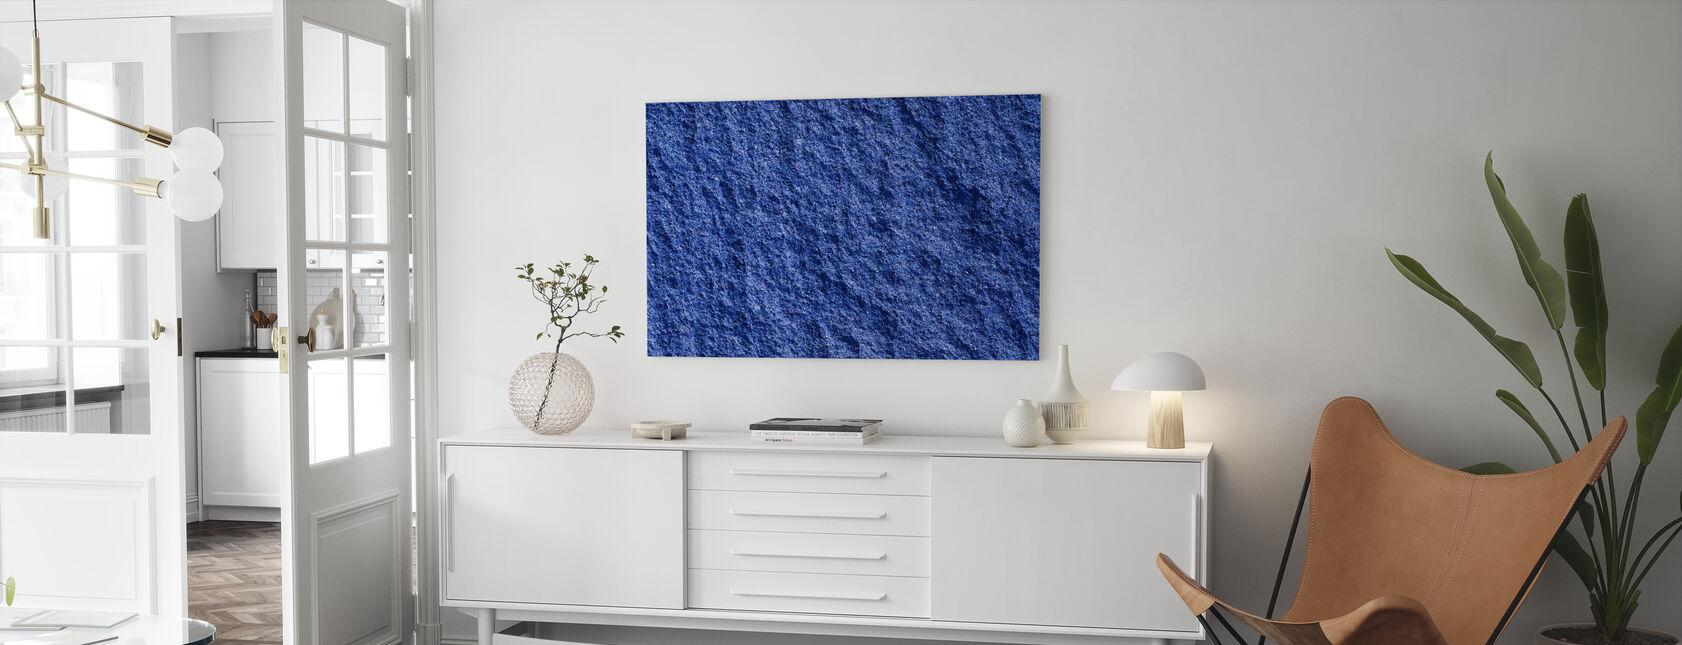 Granito Azul - Lienzo - Salón